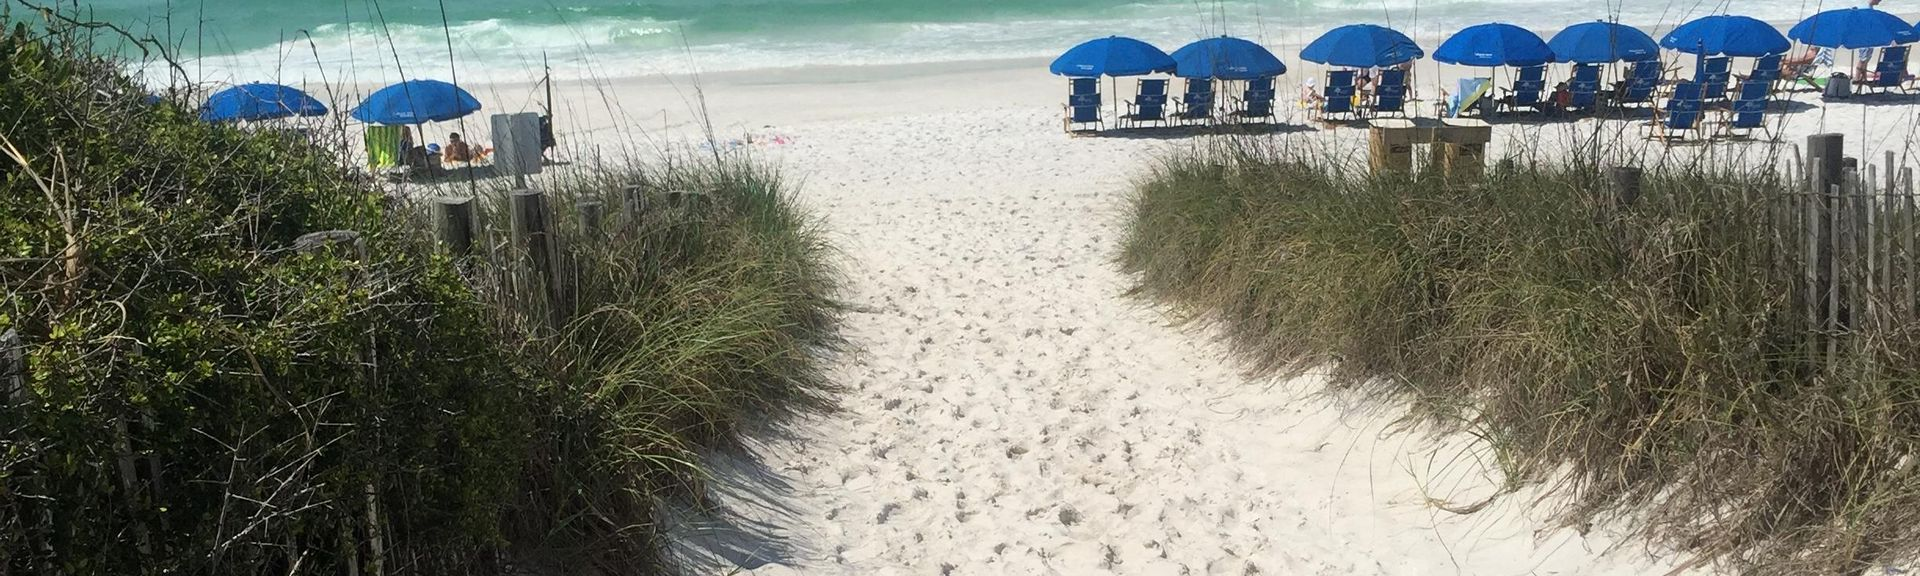 Cottage District, Seaside, FL, USA